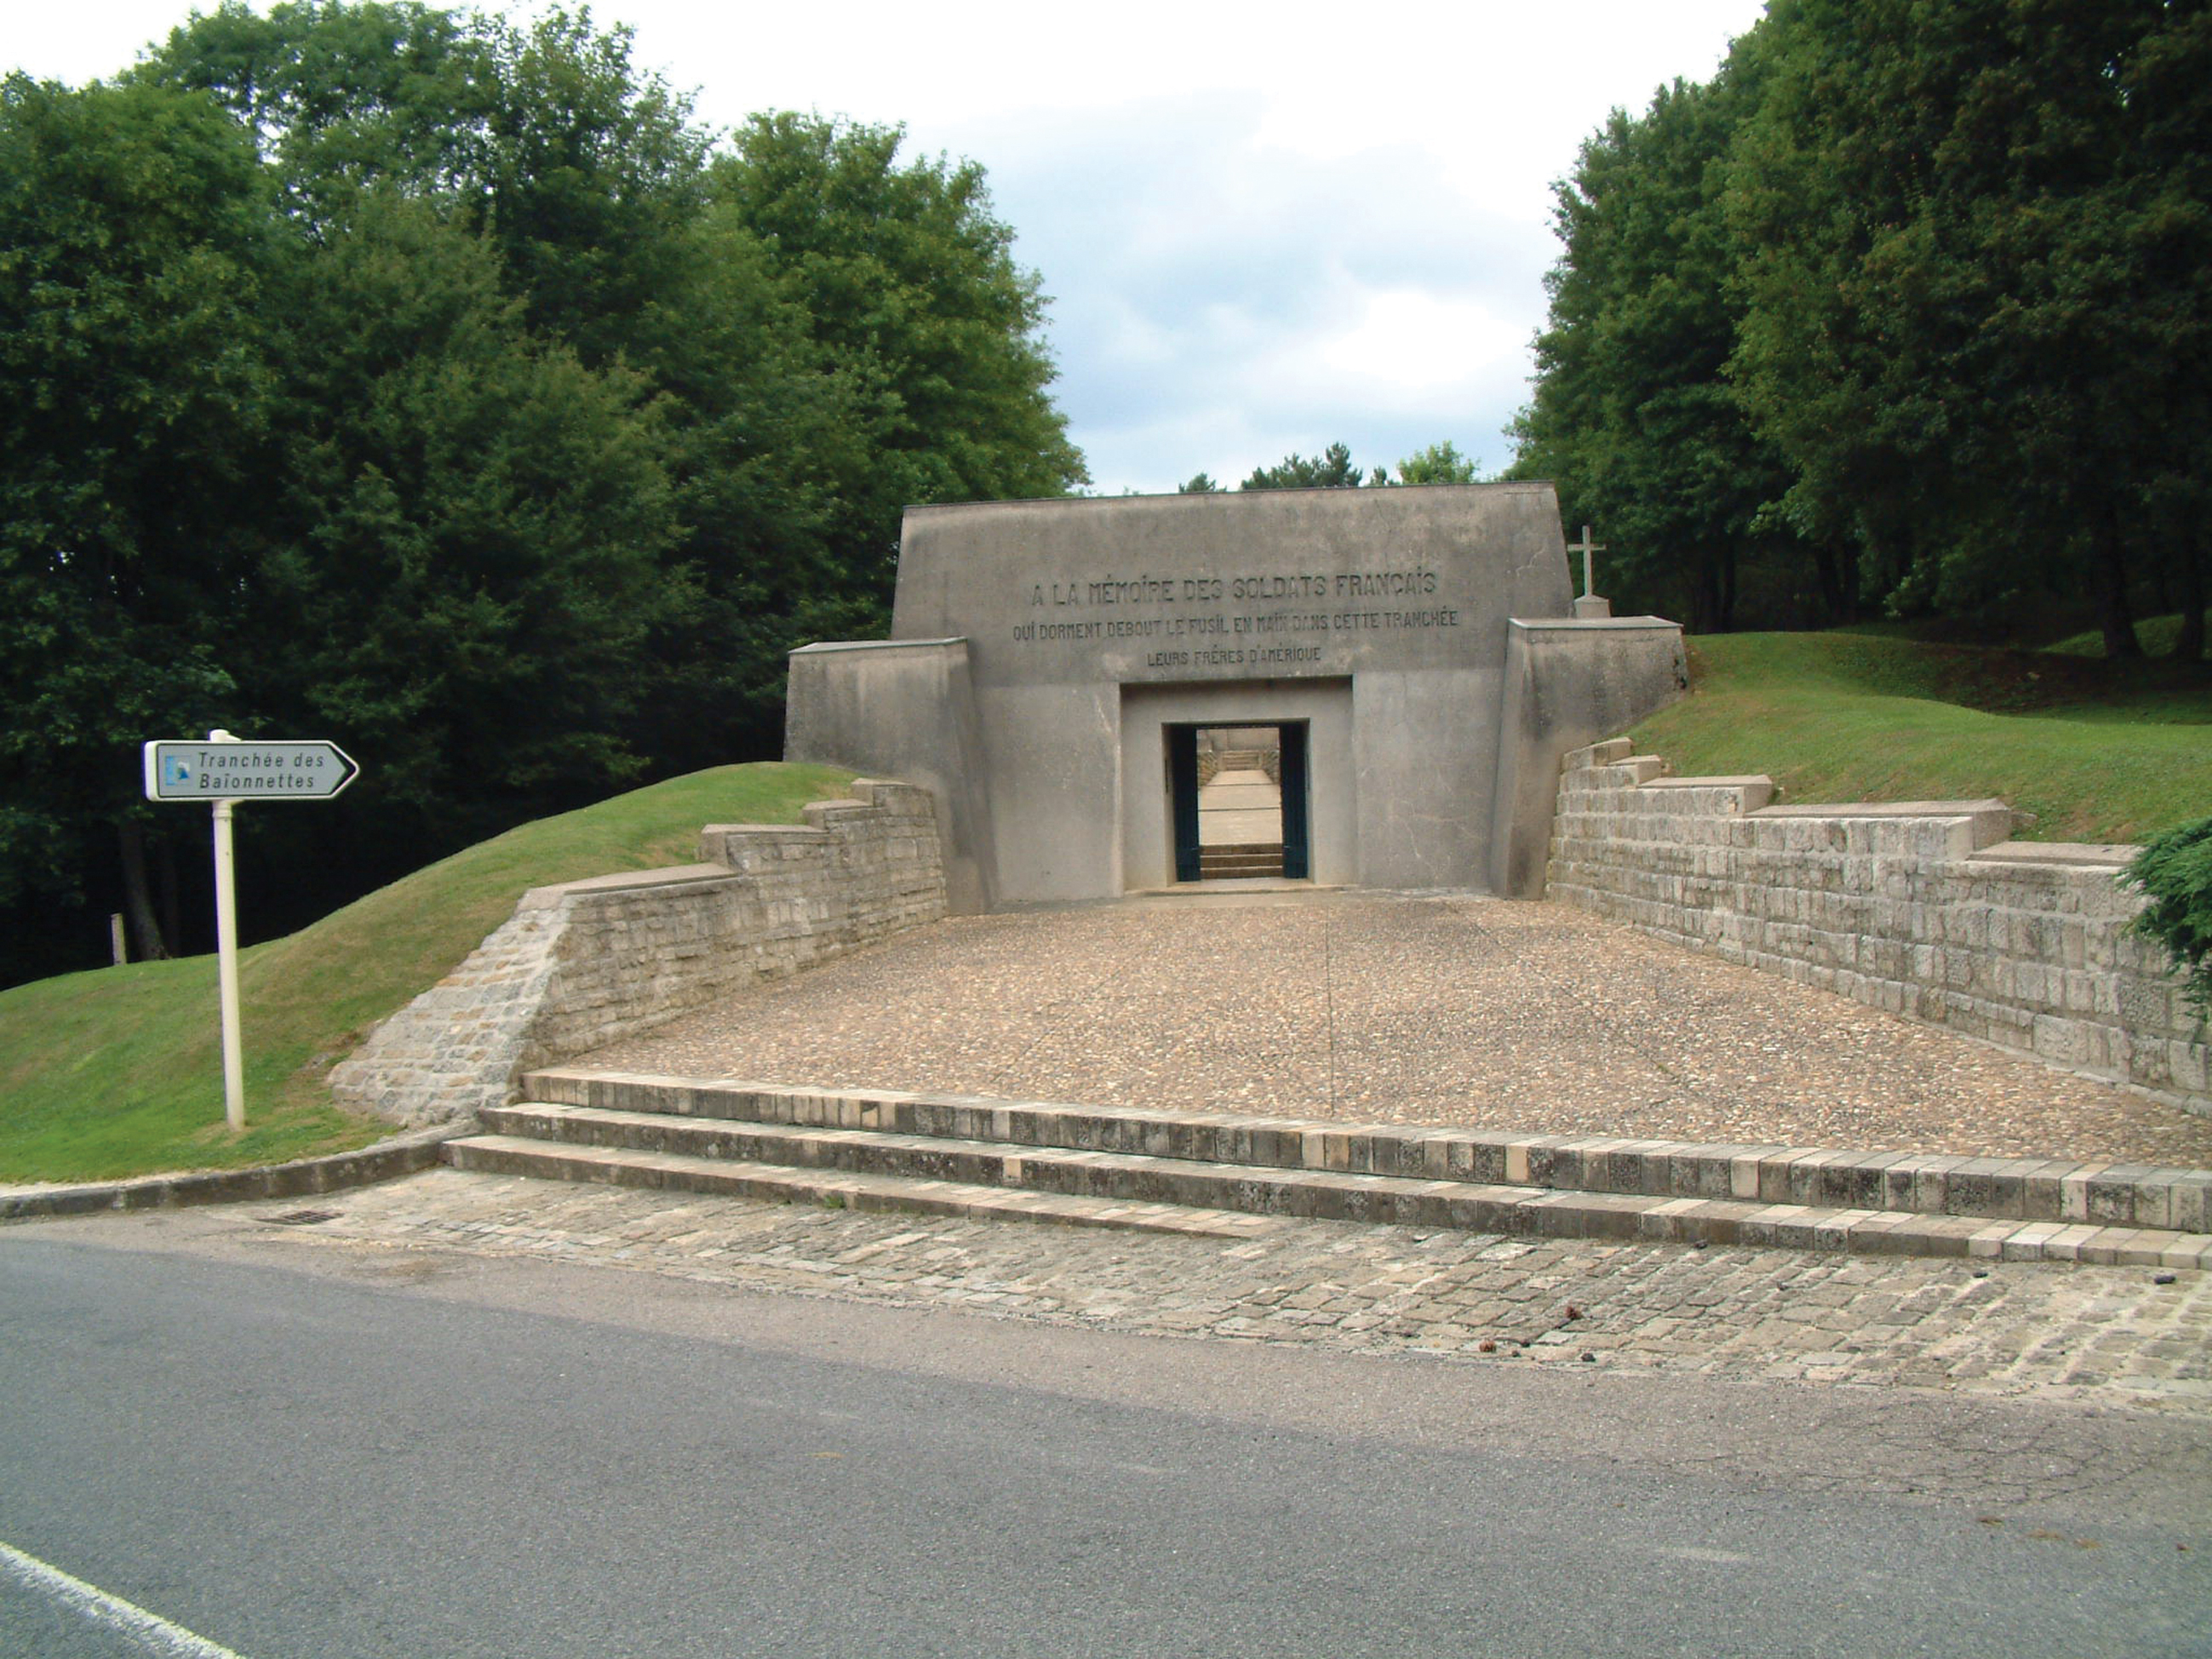 verdun singles The battle of verdun (bataille de verdun, ipa: [bataj də vɛʁdœ̃], schlacht um verdun, ipa: [ʃlaxt ˀʊm ˈvɛɐdœŋ]), fought from 21 february to 18 december 1916, was the largest and longest battle of the first world war on the.